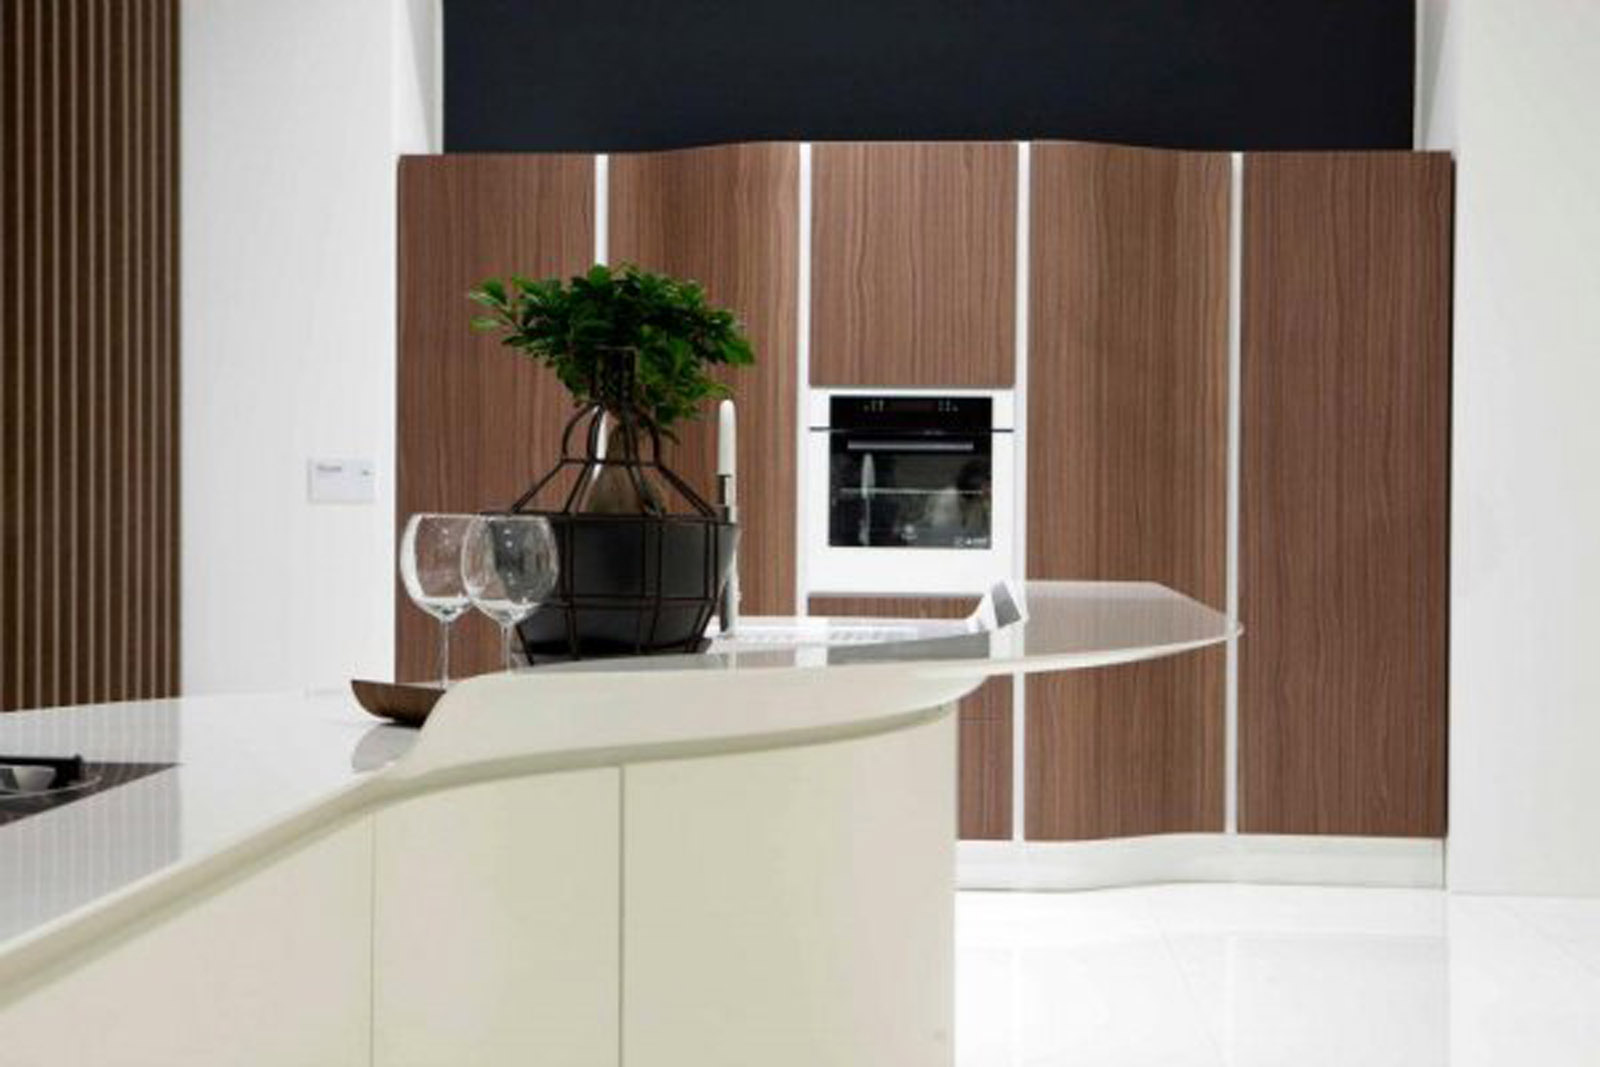 Come arredare la cucina moderna novit 2015 catania - Arredare la cucina ...